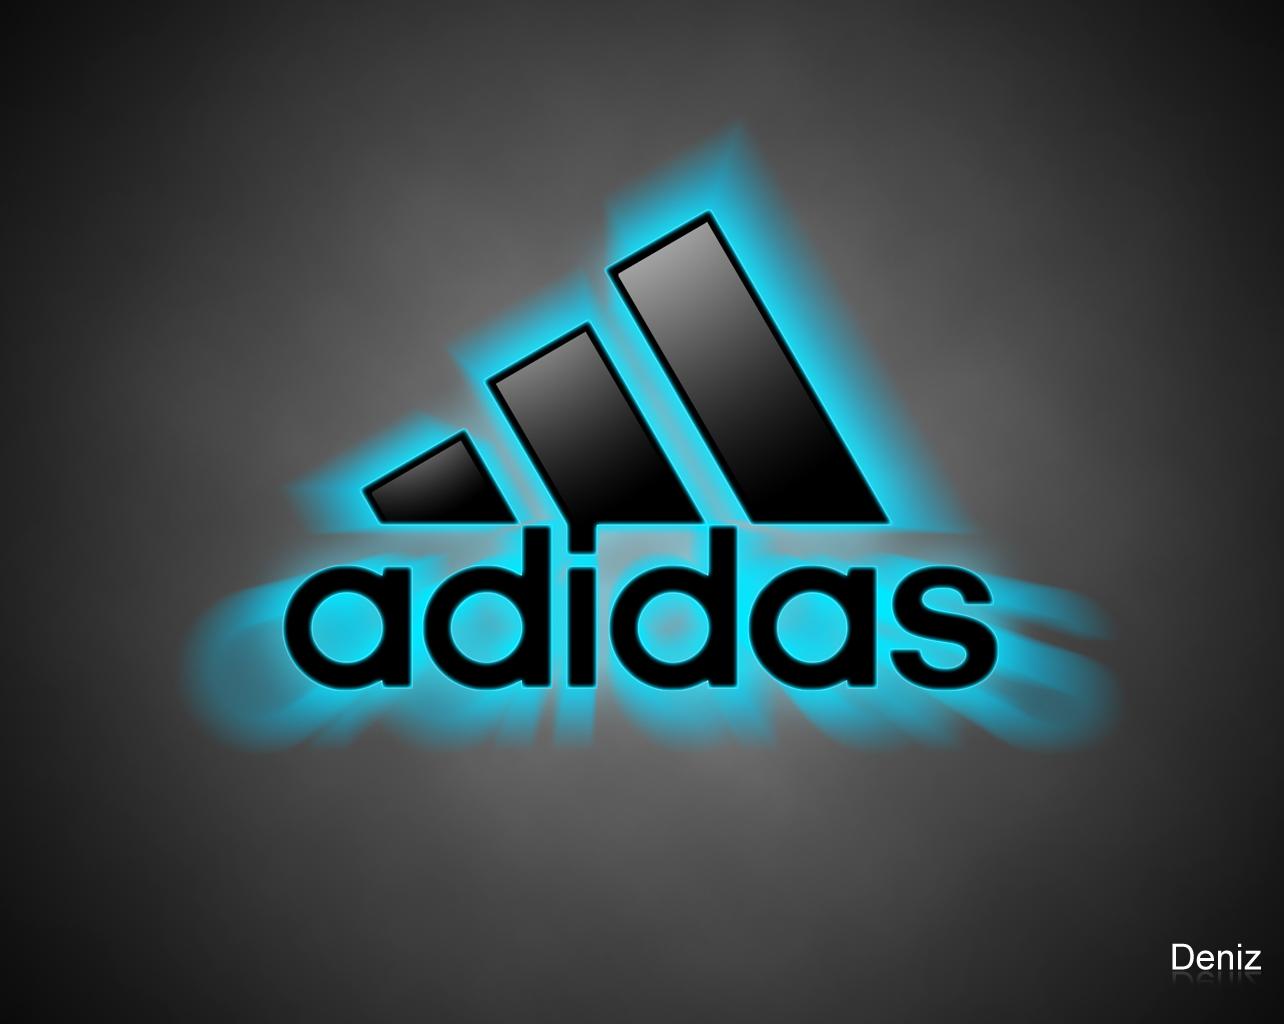 Adidas Football Wallpaper Hd 3d   Football Wallpaper HD Football 1284x1024